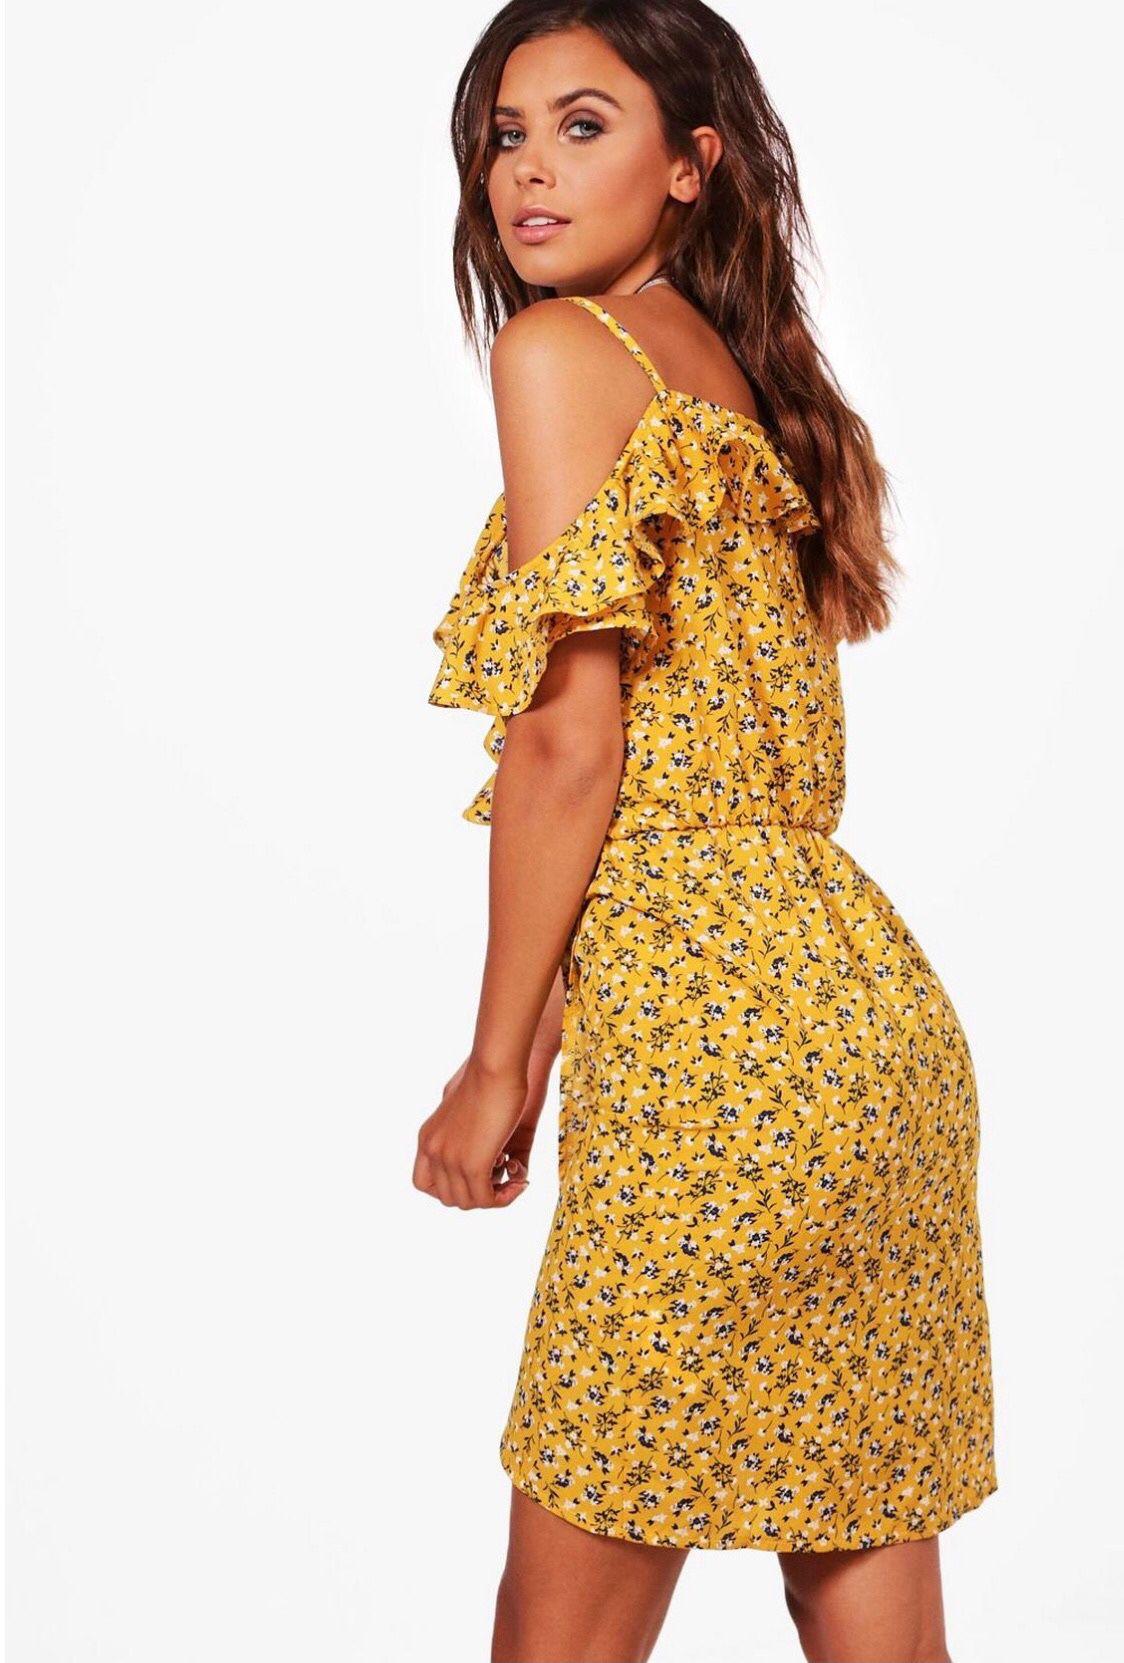 Floral Frilly Frilled Wrap Spring & Summer Pretty Cold Shoulder Mini Dress